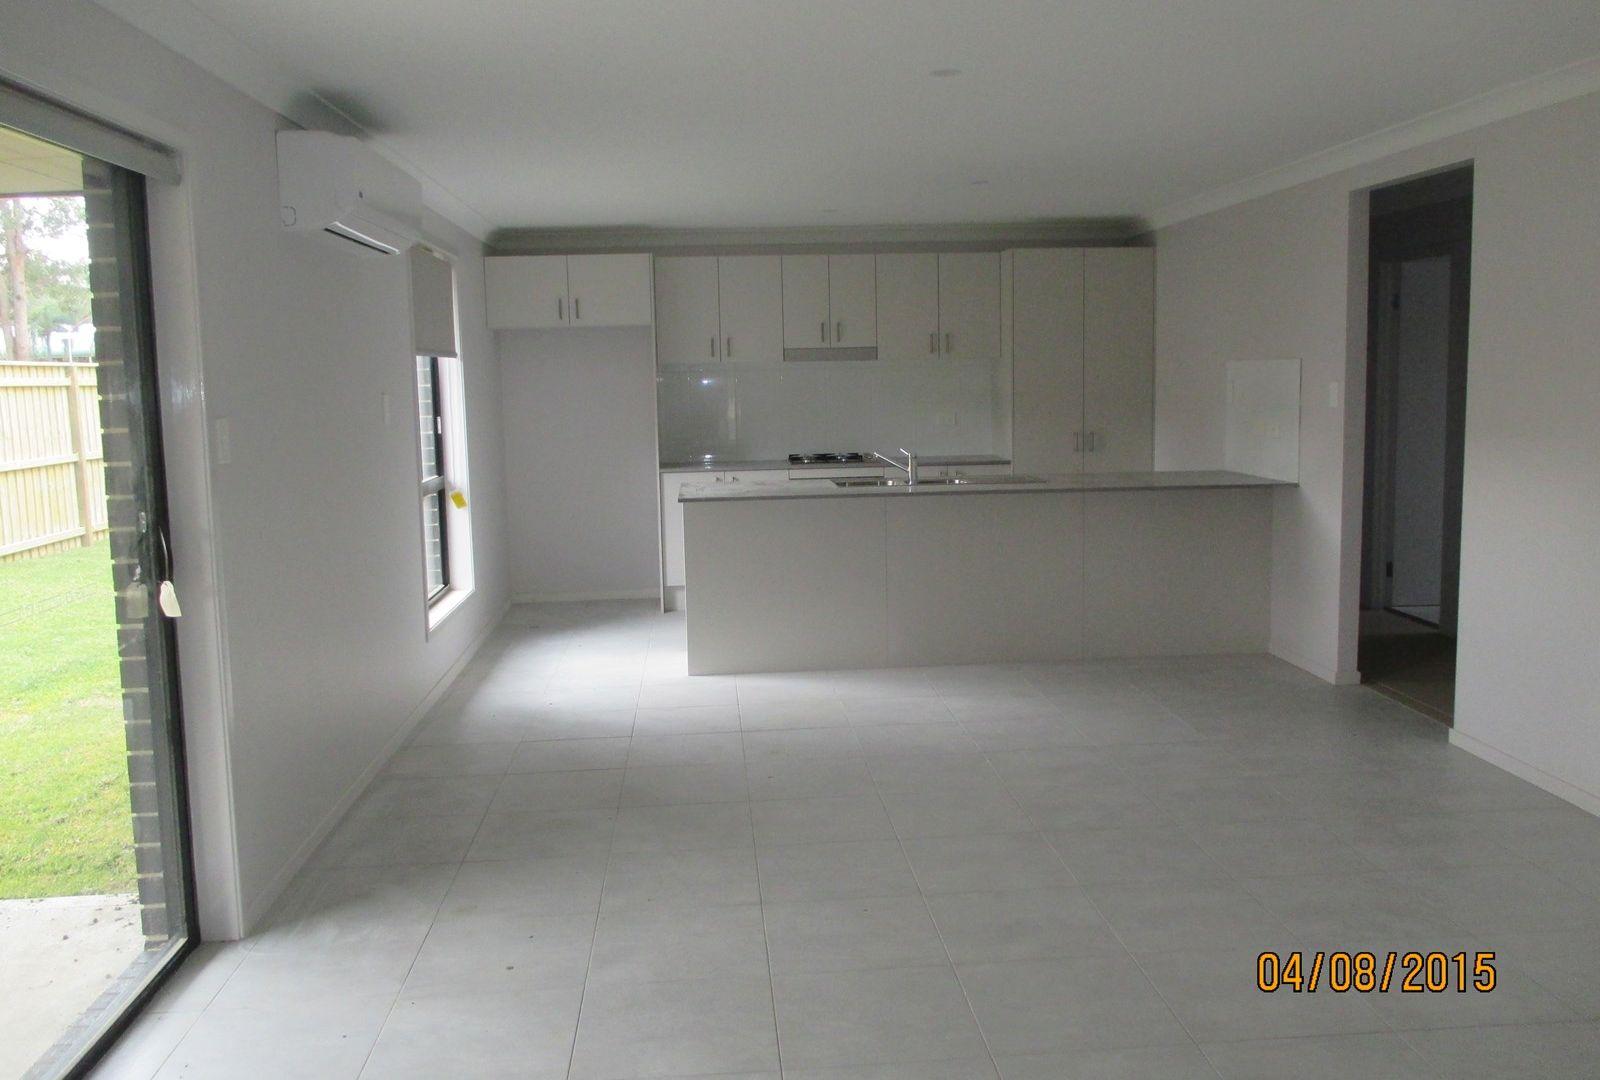 29 Catalina Road, San Remo NSW 2262, Image 1